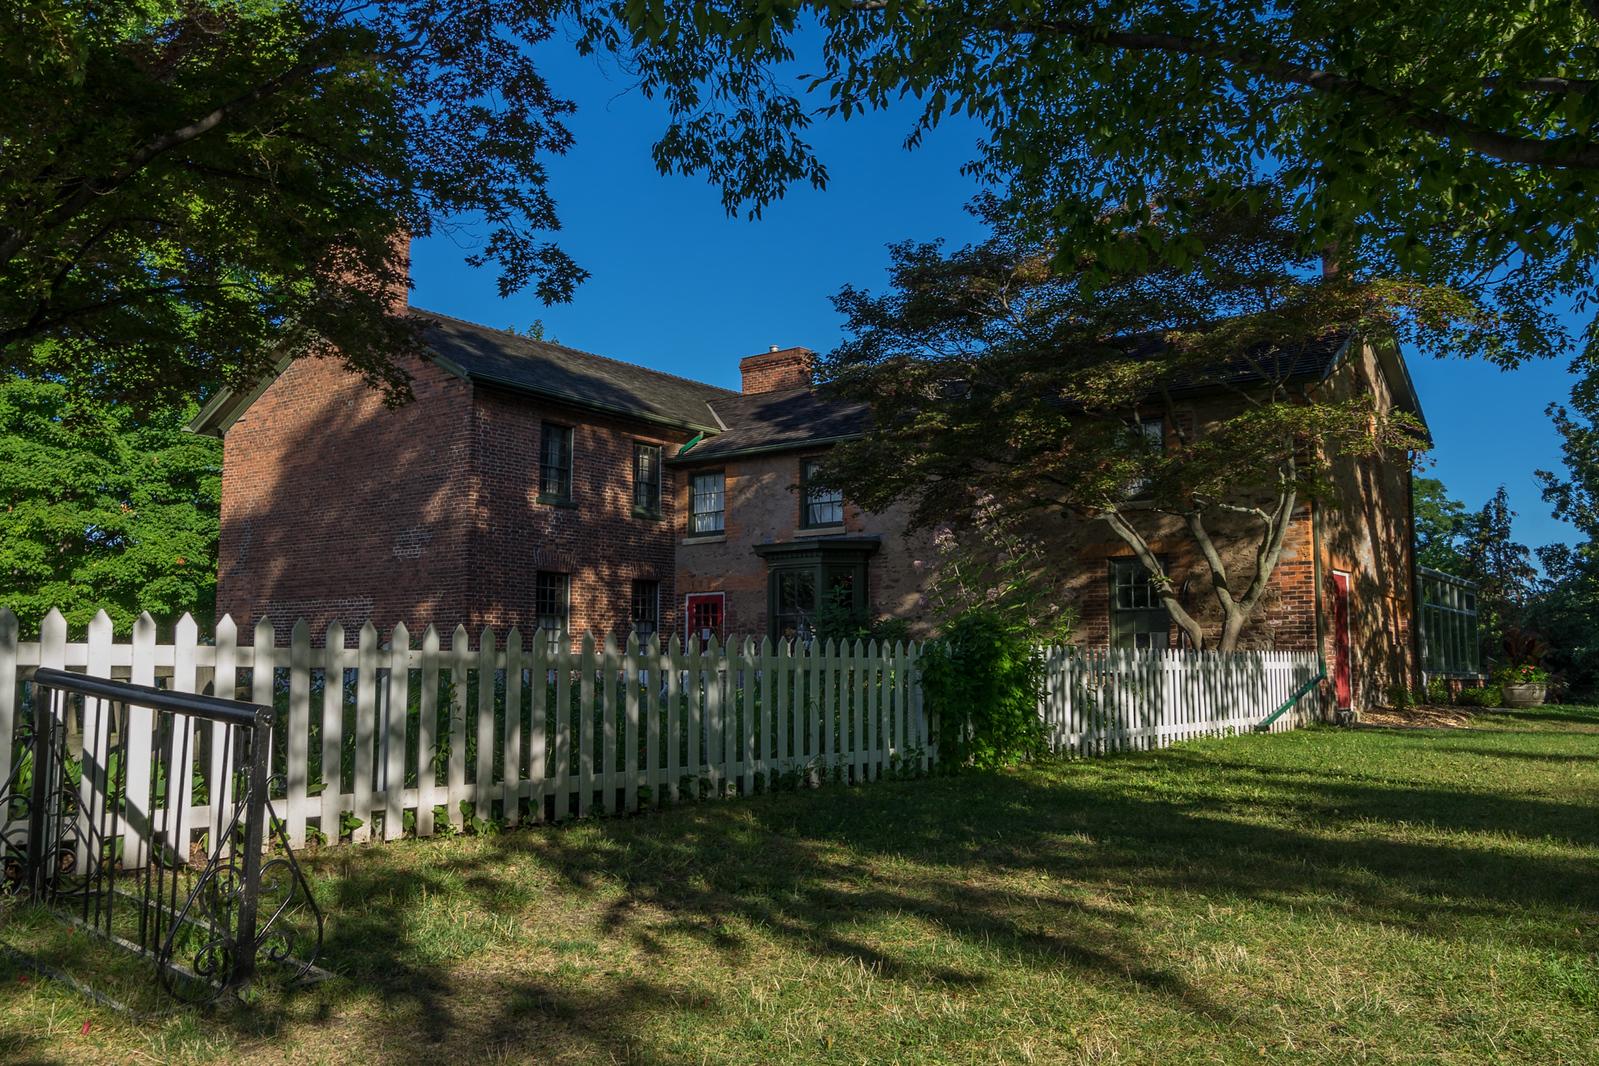 Niagara Falls Road Trip stop #3: McFarland House